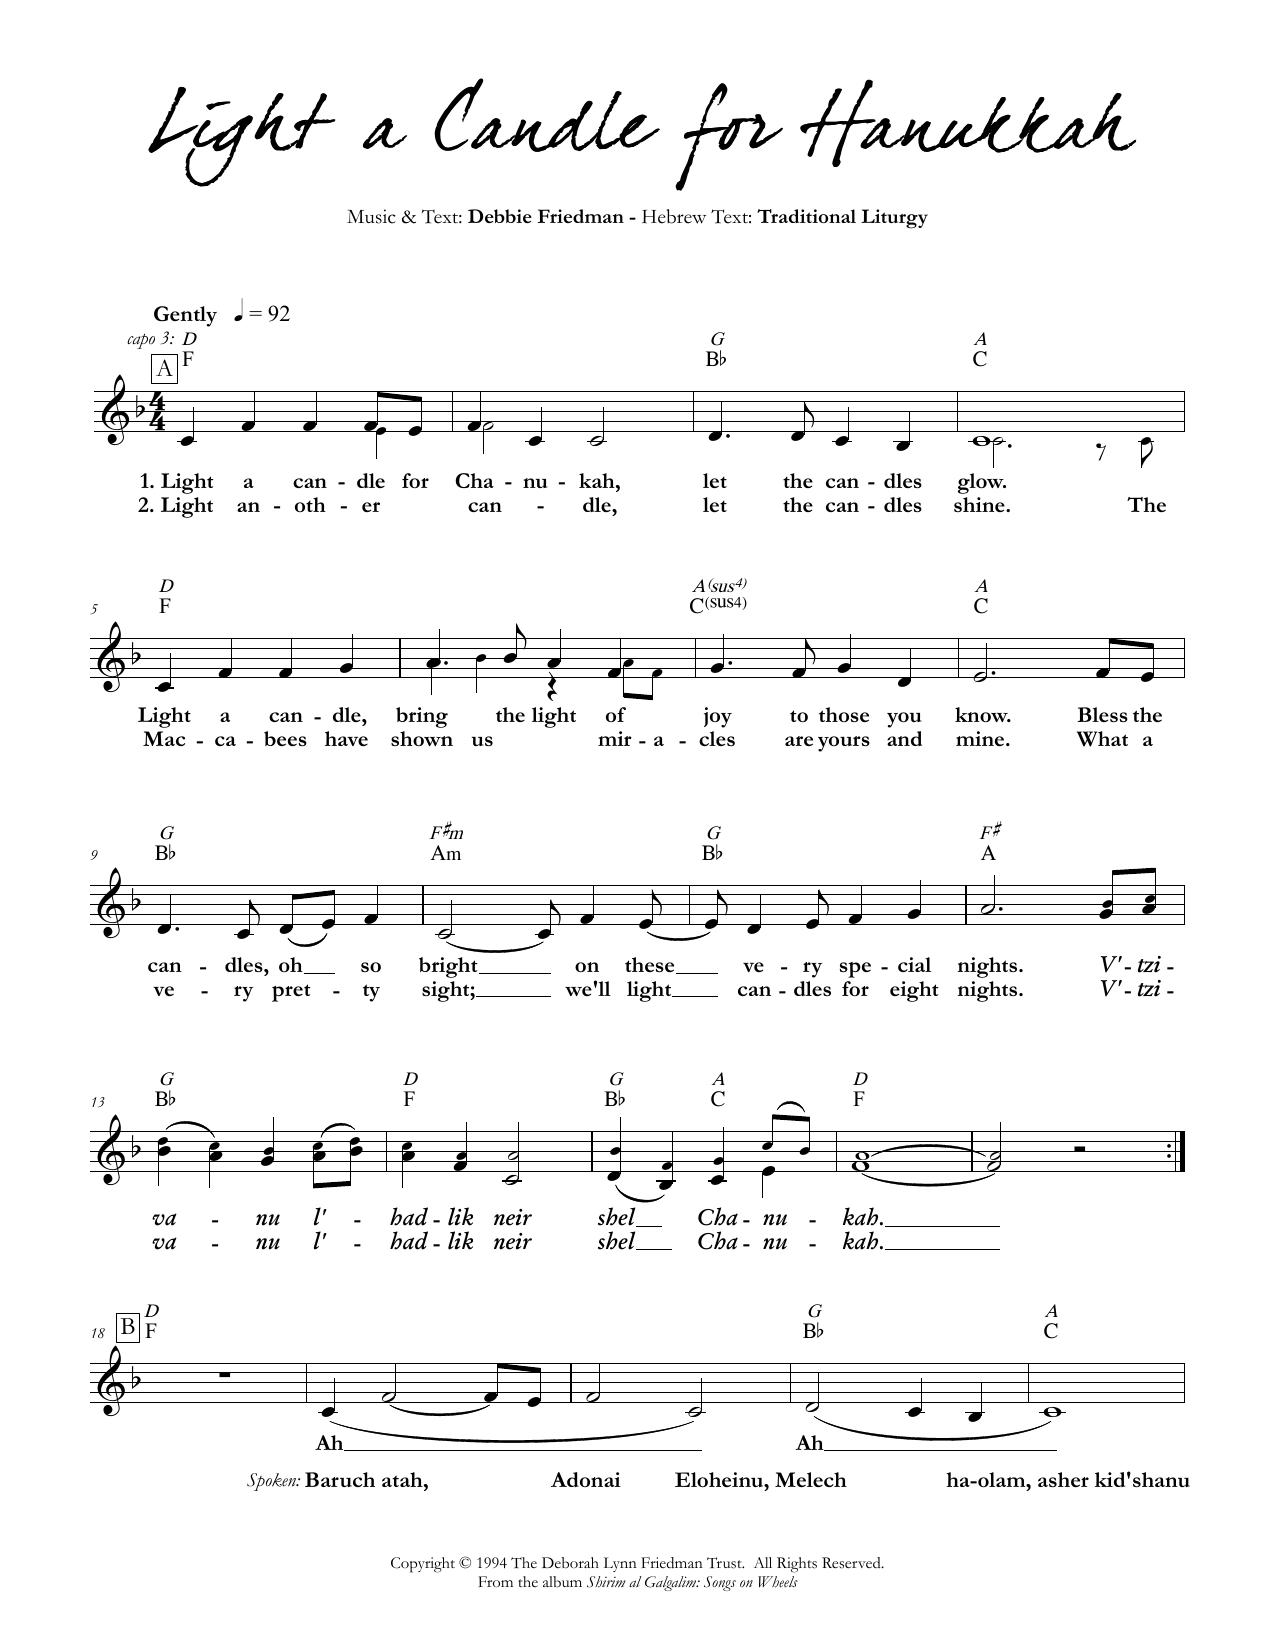 Light a Candle for Hanukkah Sheet Music